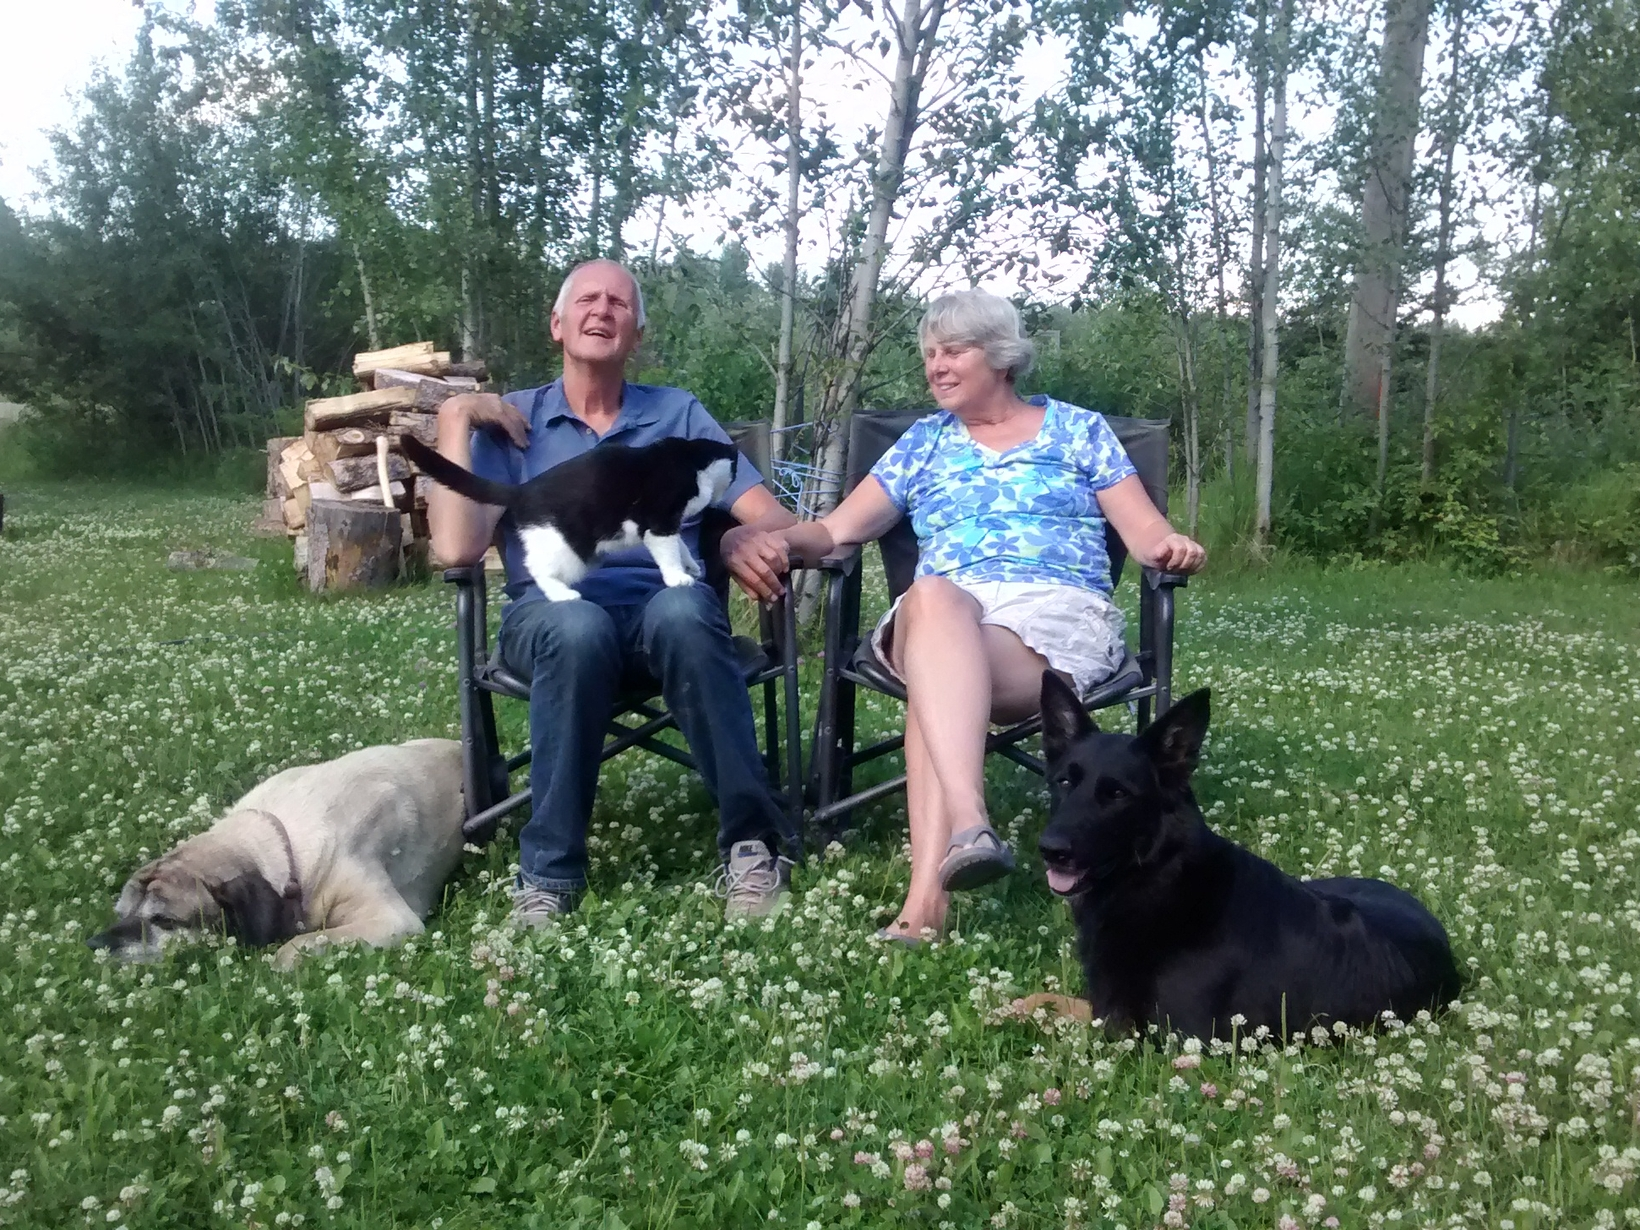 Janice and john & Janice from Edmonton, Alberta, Canada